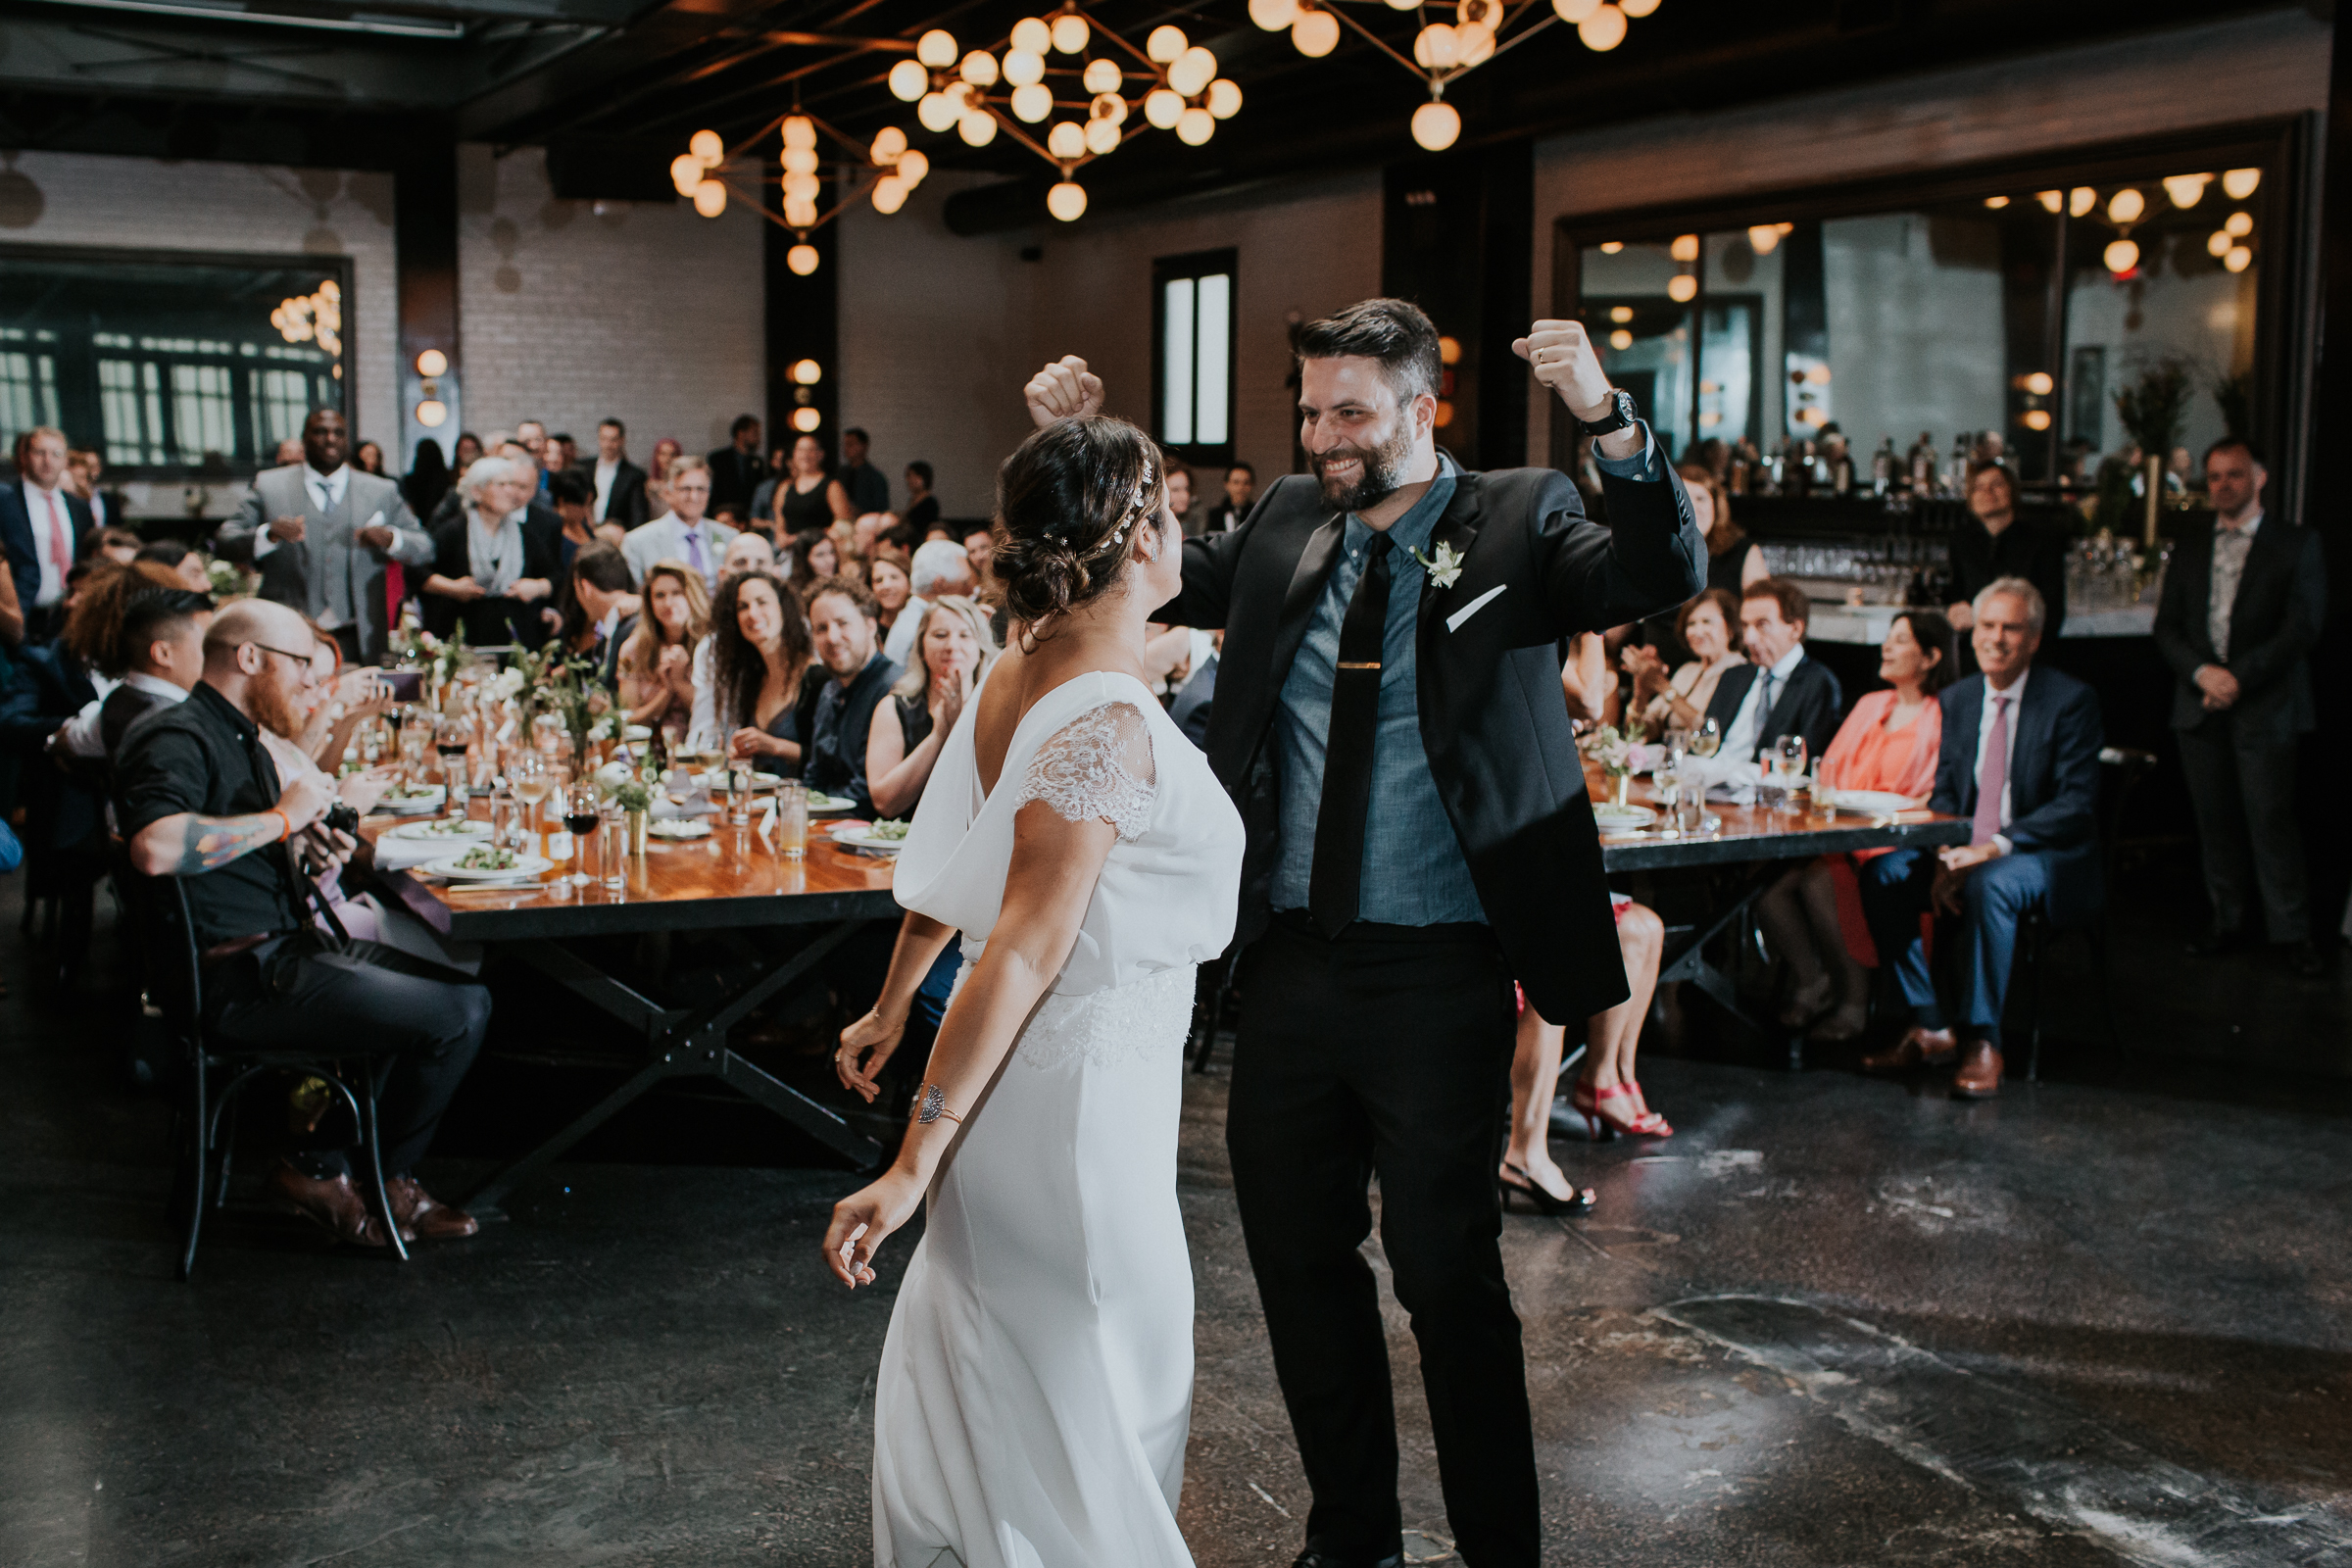 501-Union-Brooklyn-Fine-Art-Documentary-Wedding-Photographer-114.jpg